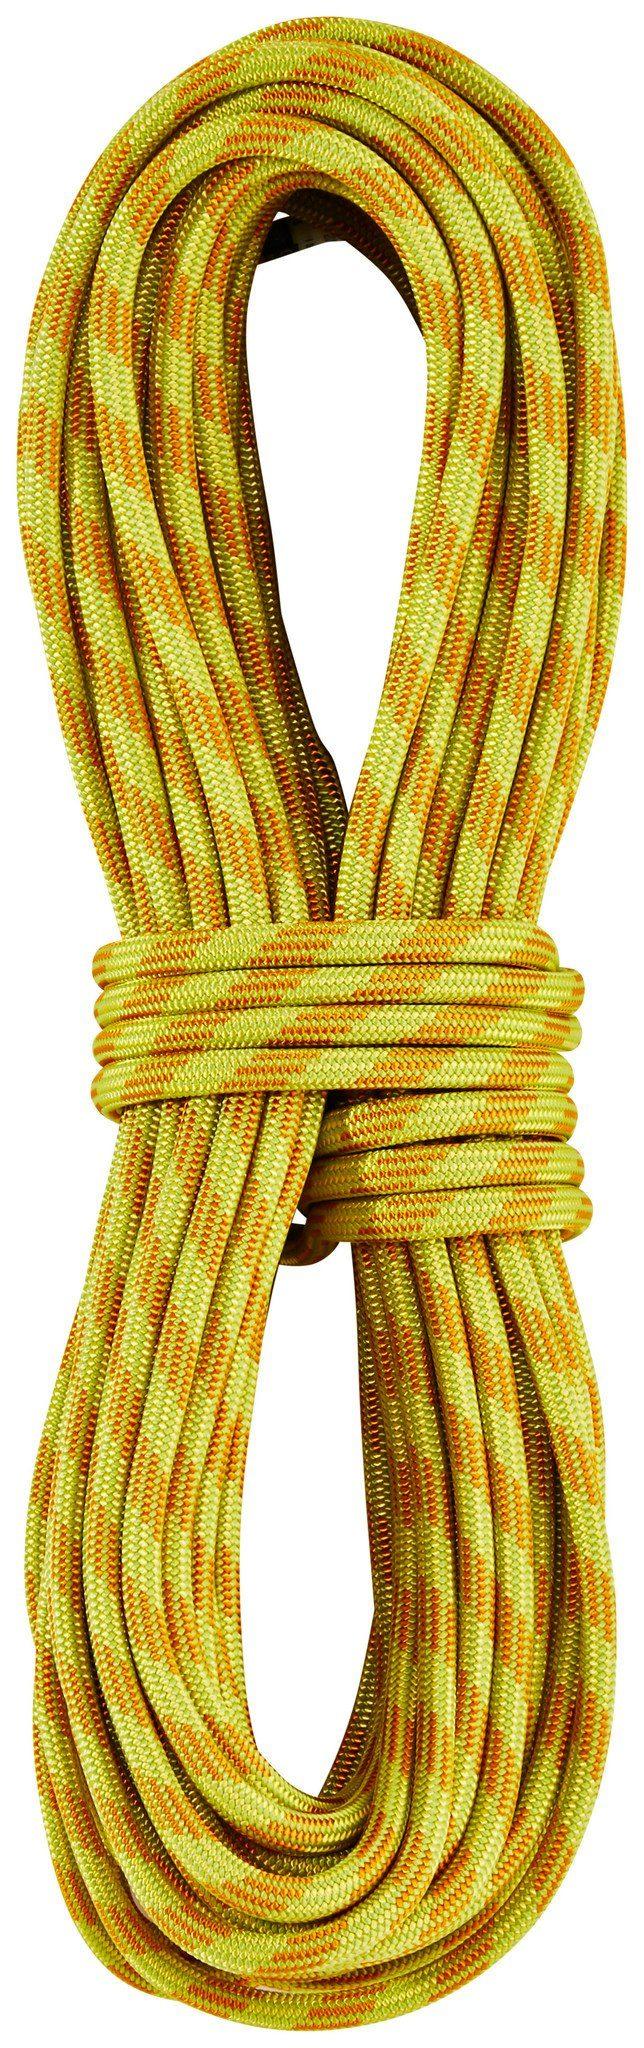 Edelrid Kletterseil »Confidence Rope 8mm 30m«